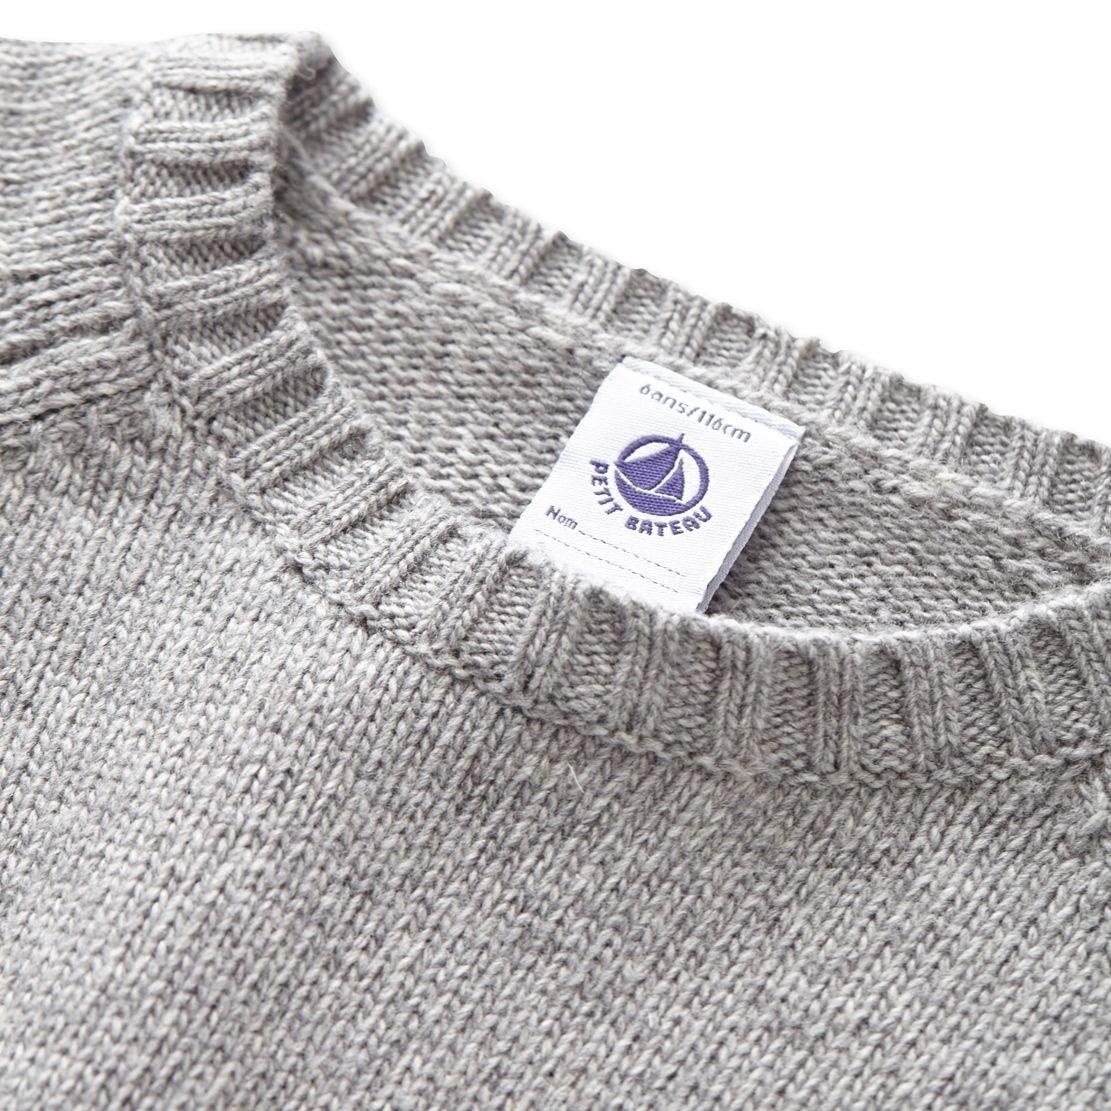 HNO Store Moon-Landing-Apollo-11-50th-Anniversary-1969-2019 Sweatshirt for Mens Womens Up to 5XL